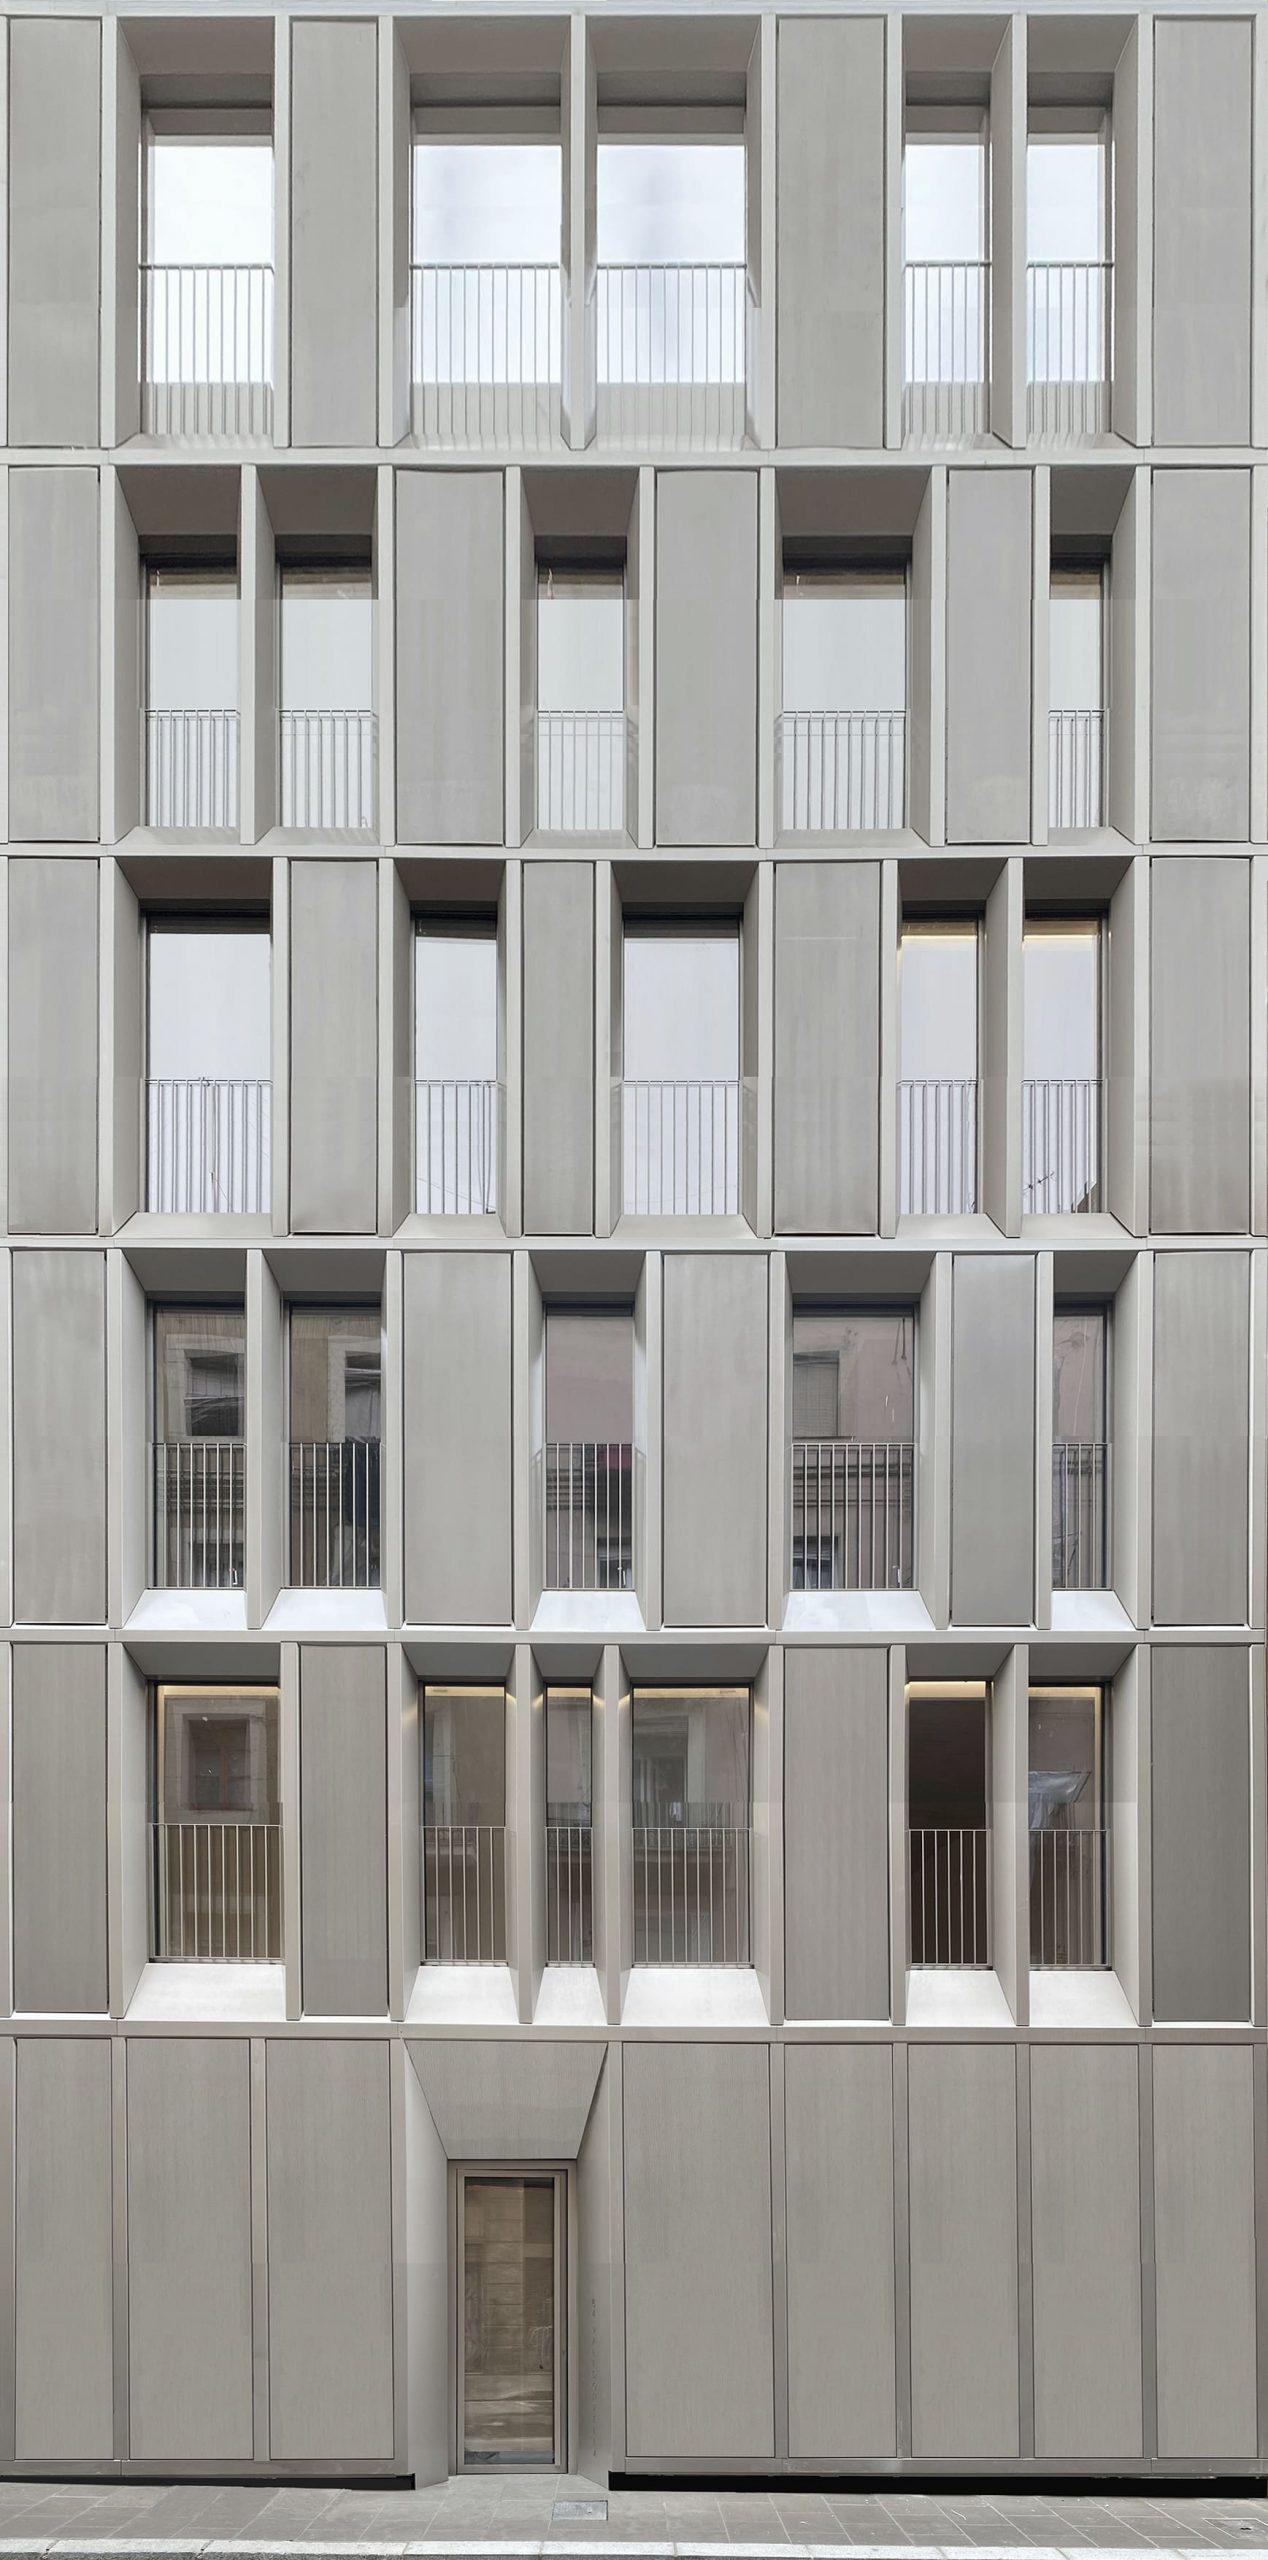 Façana frontal Valldonzella 54 Barcelona Barber Renteria Arquitectes Bare